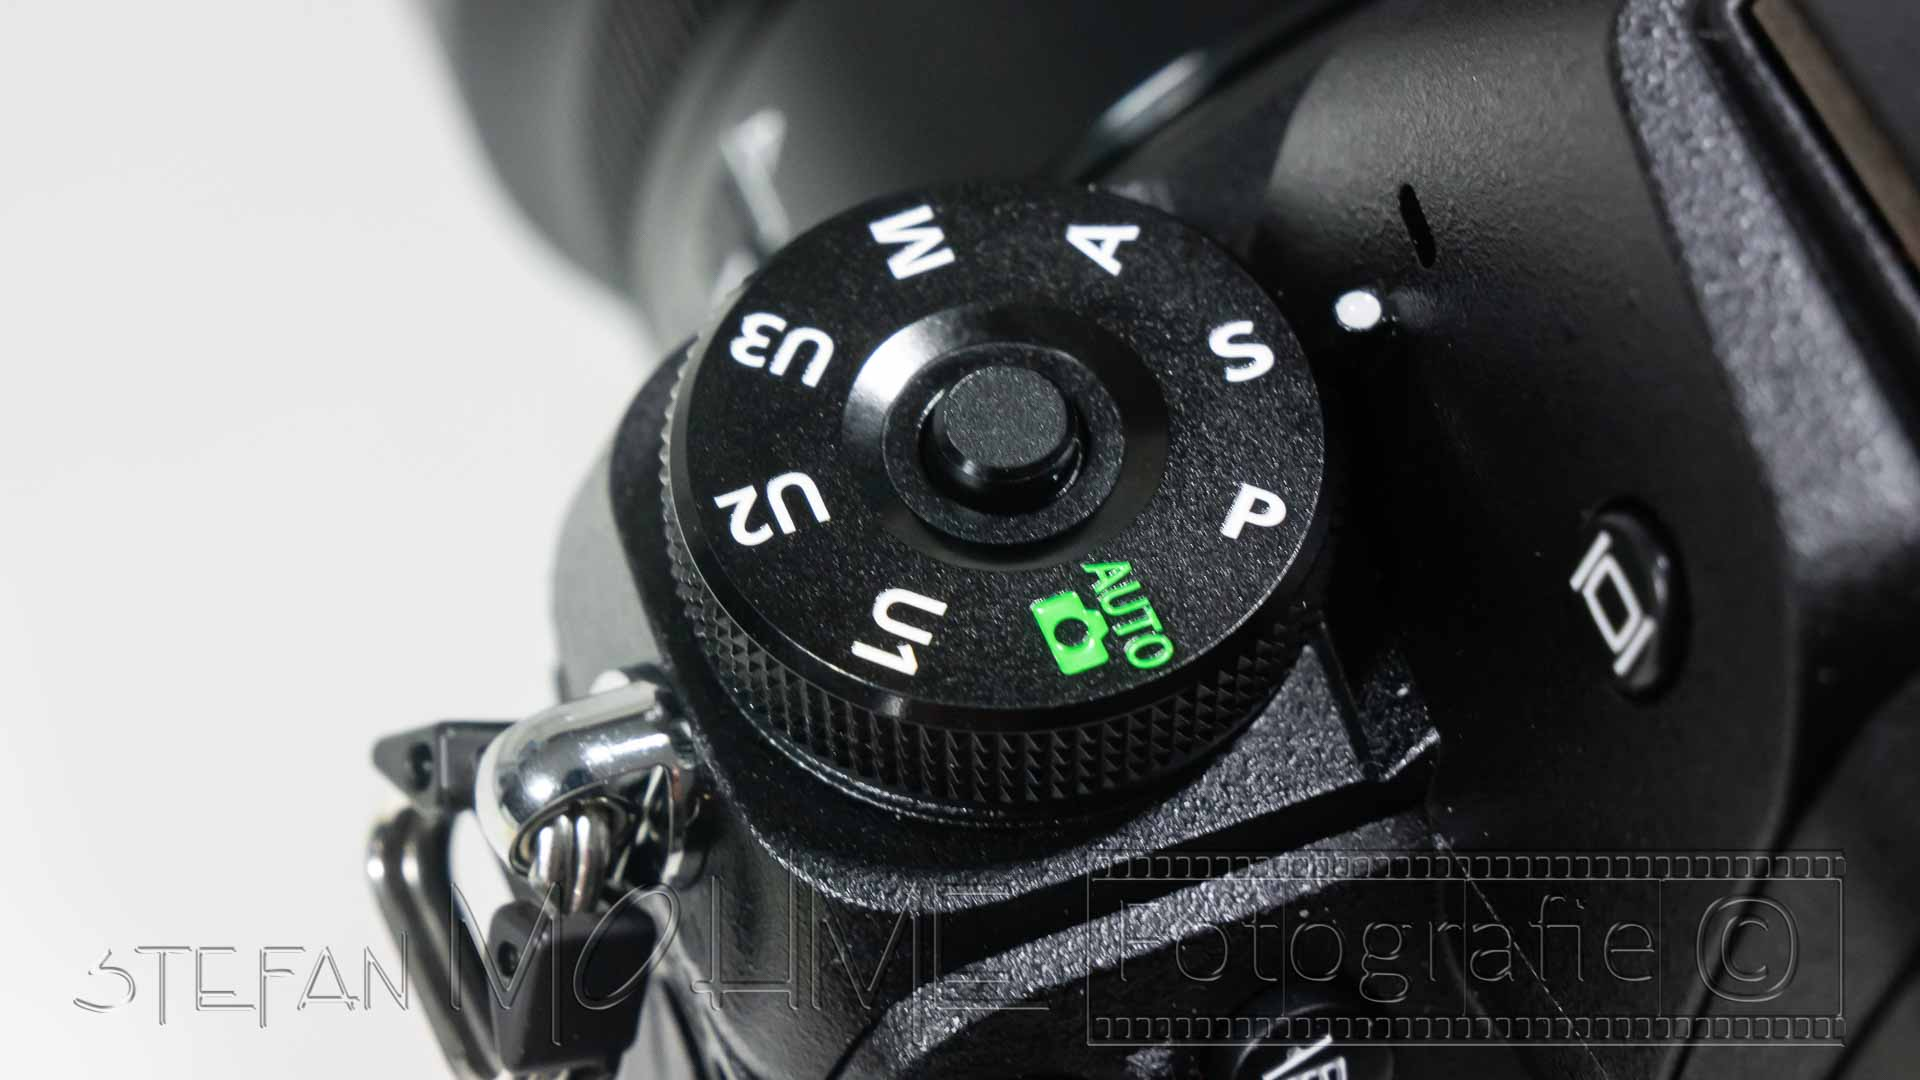 Nikon z7 Programmwahlrad Nahaufnahme,Kameraautomatik